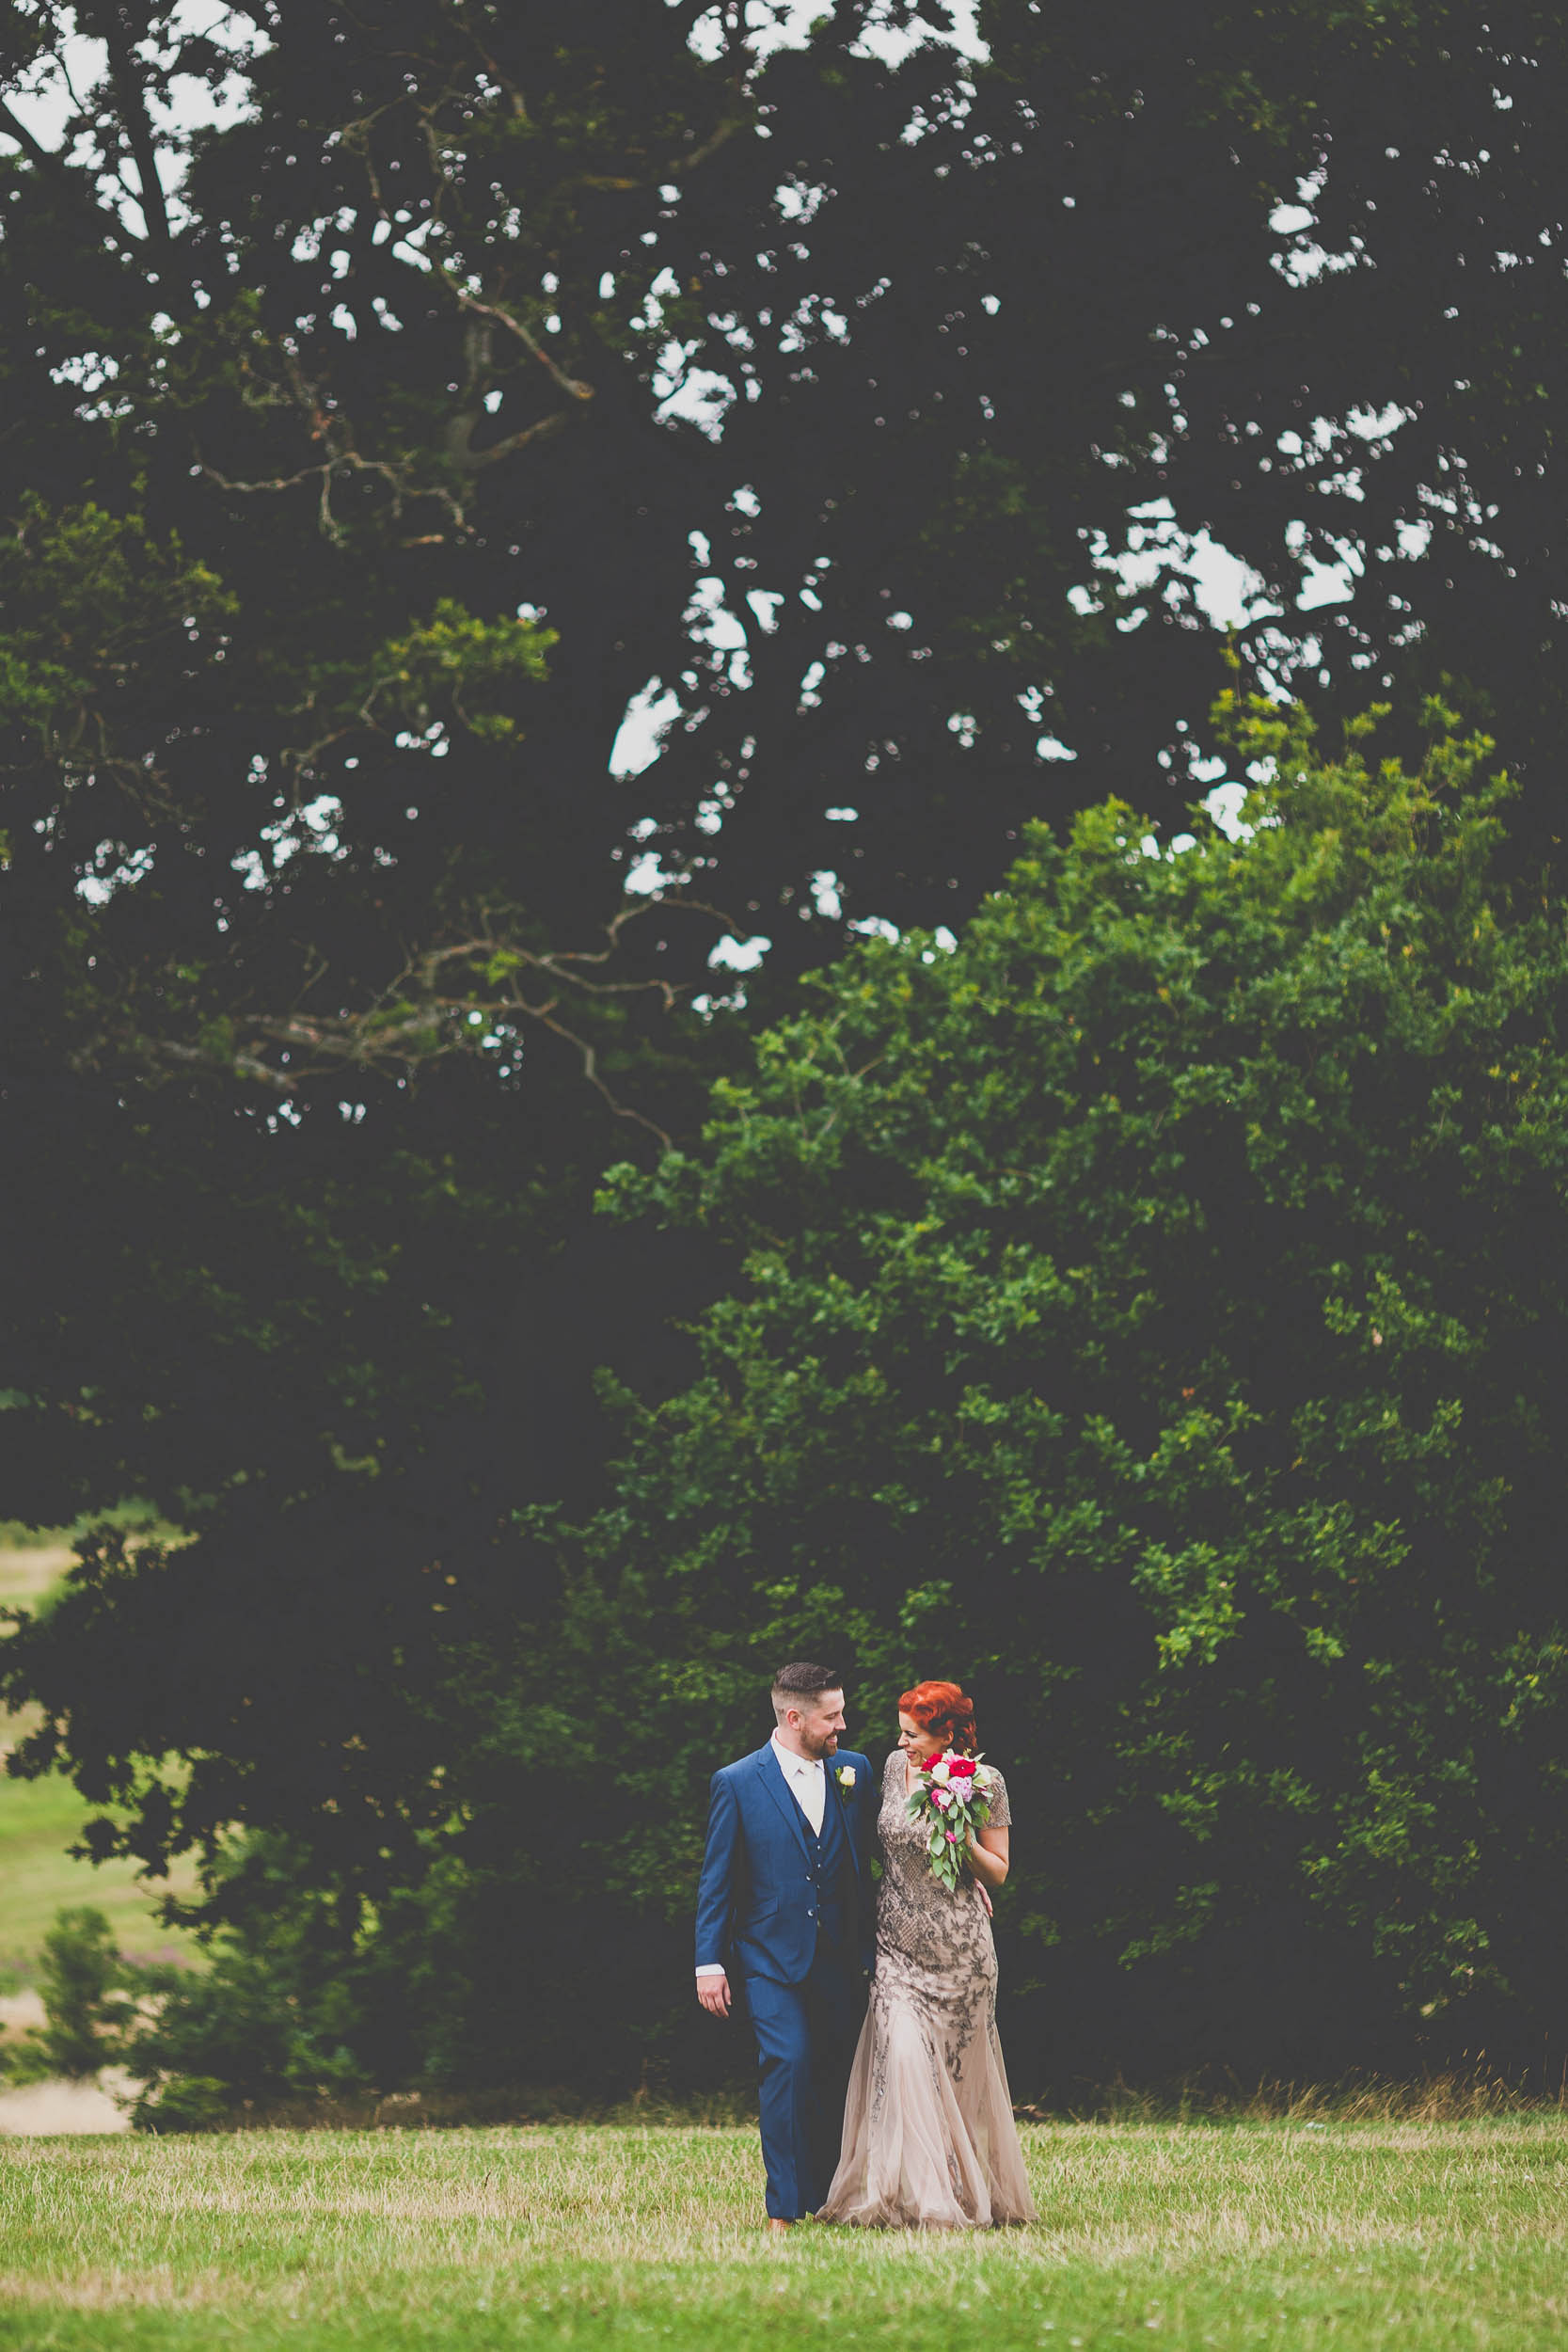 queen-elizabeths-hunting-lodge-epping-forest-wedding196.jpg